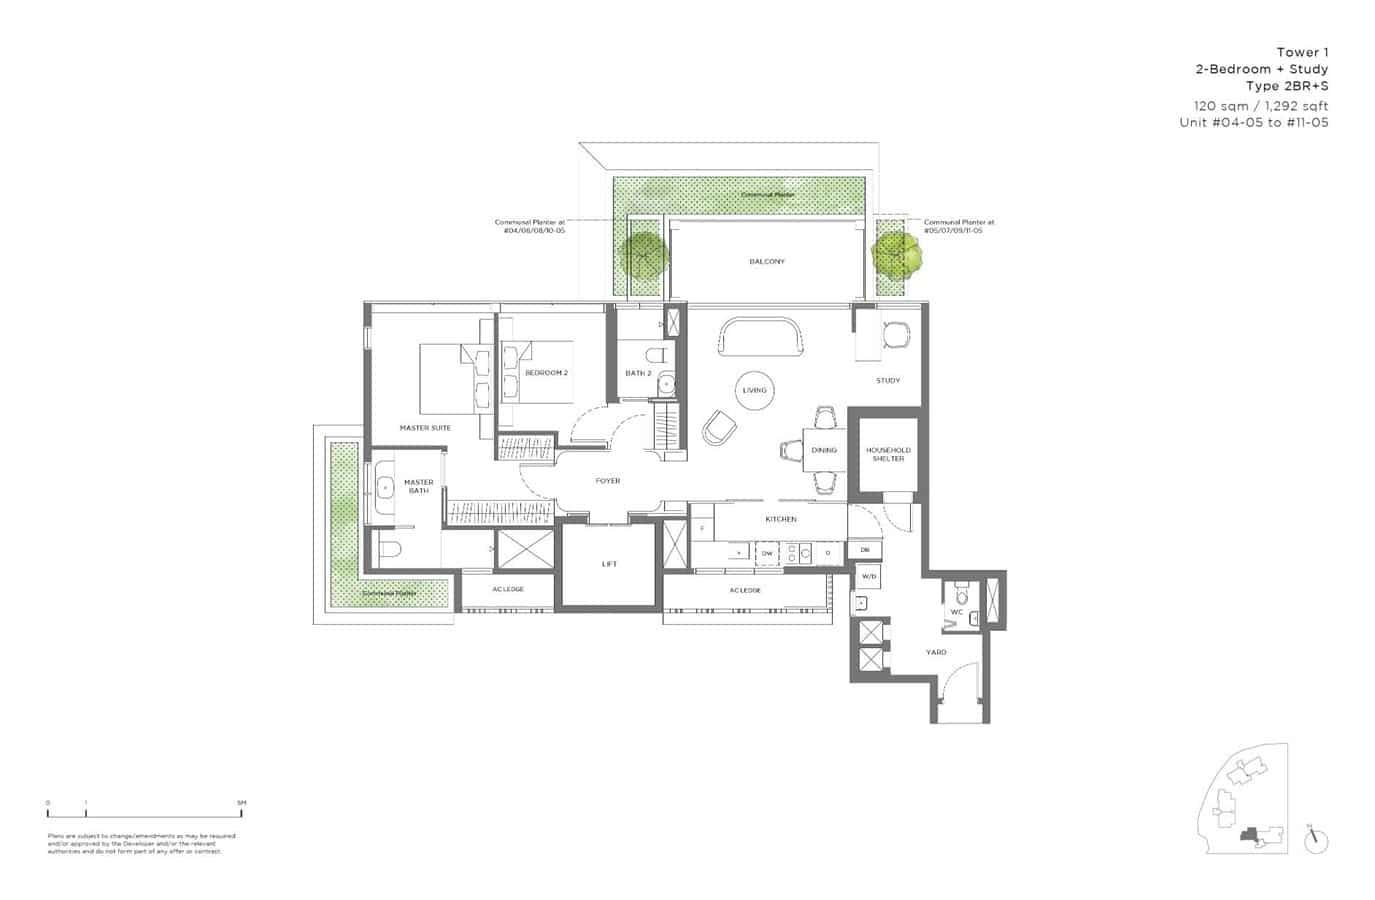 15 Holland Hill - Floor Plan - 2 Bedroom + Study 2BR+S